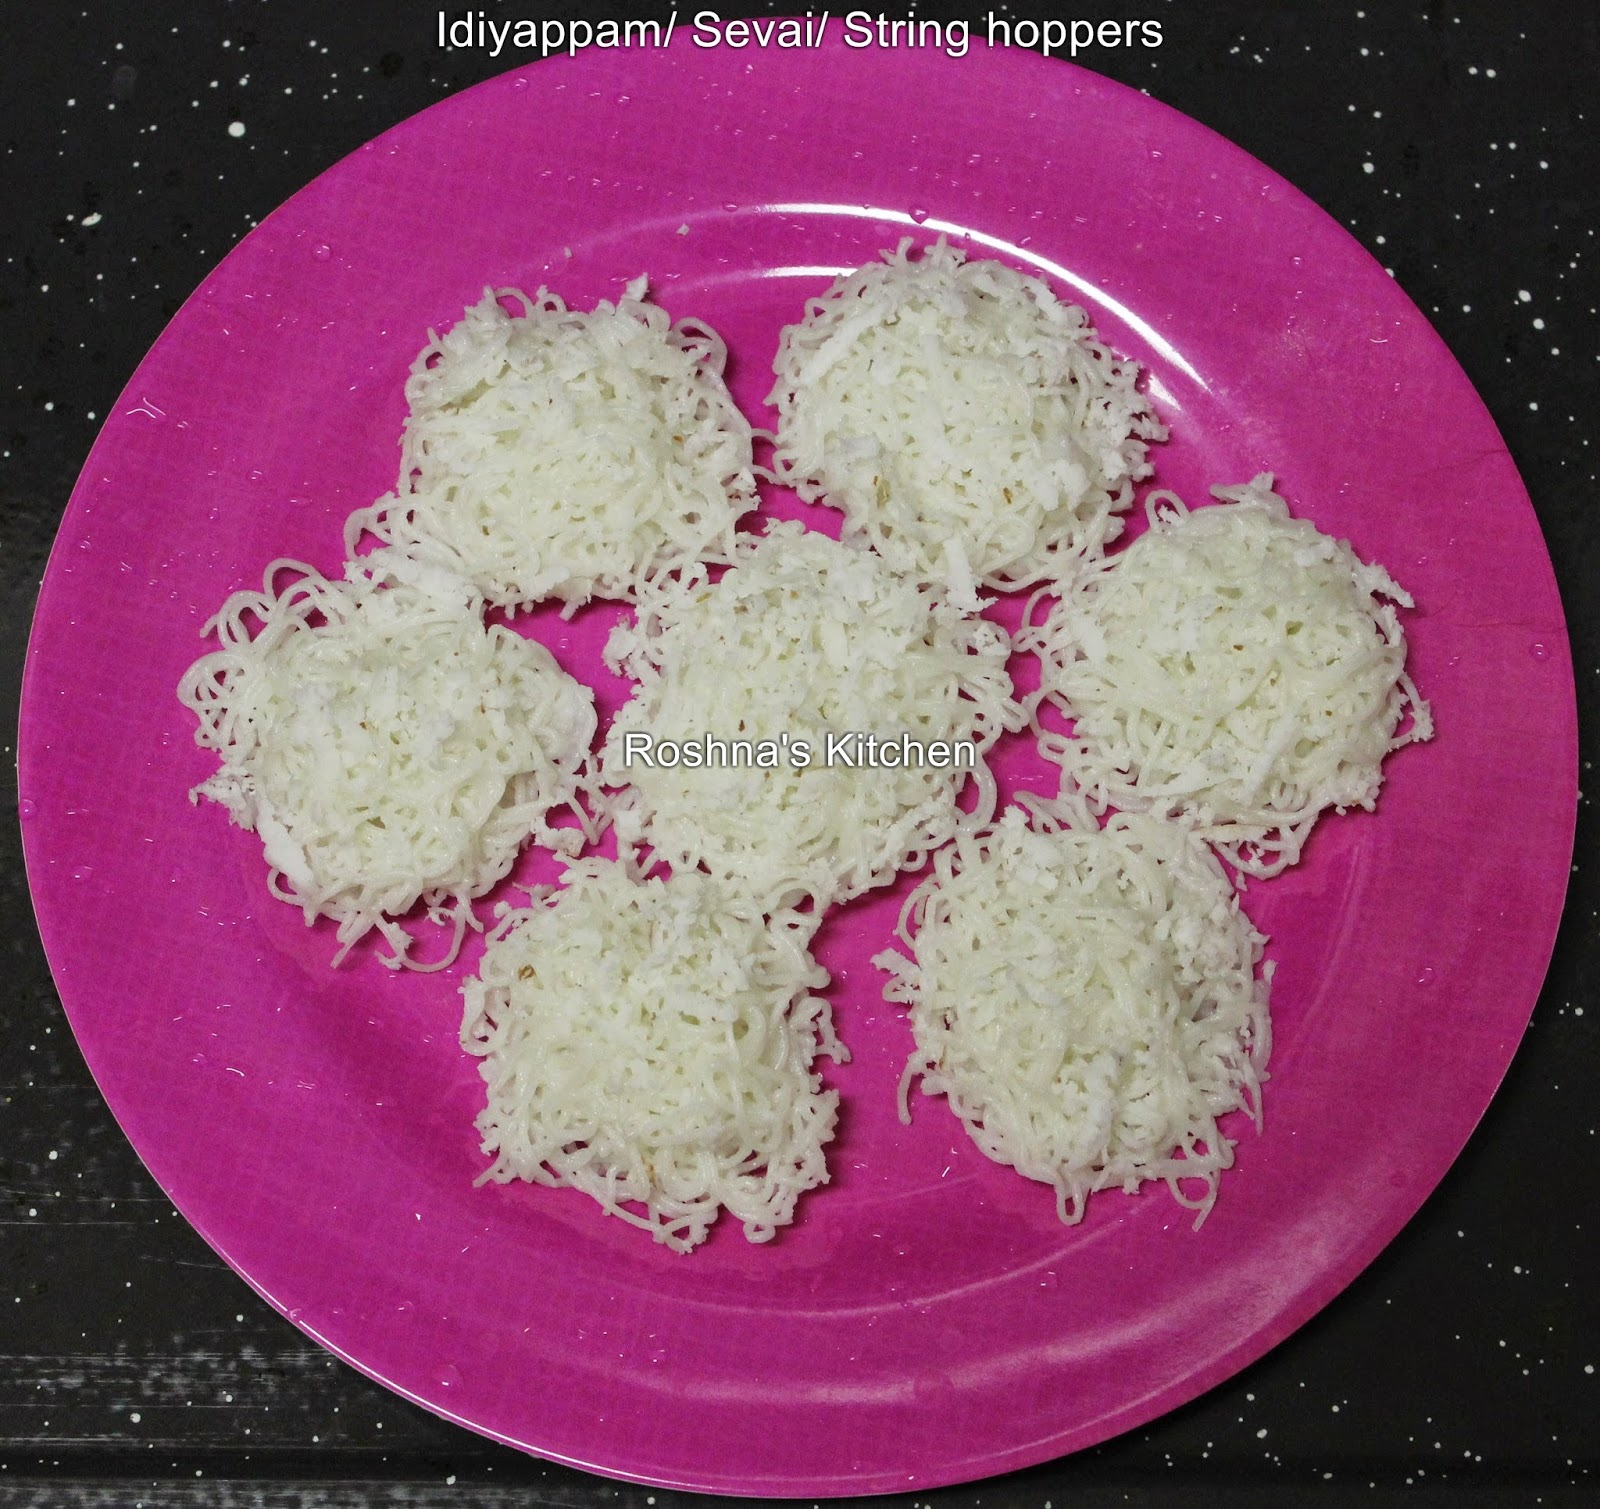 Idiyappam/ Sevai/ String hoppers